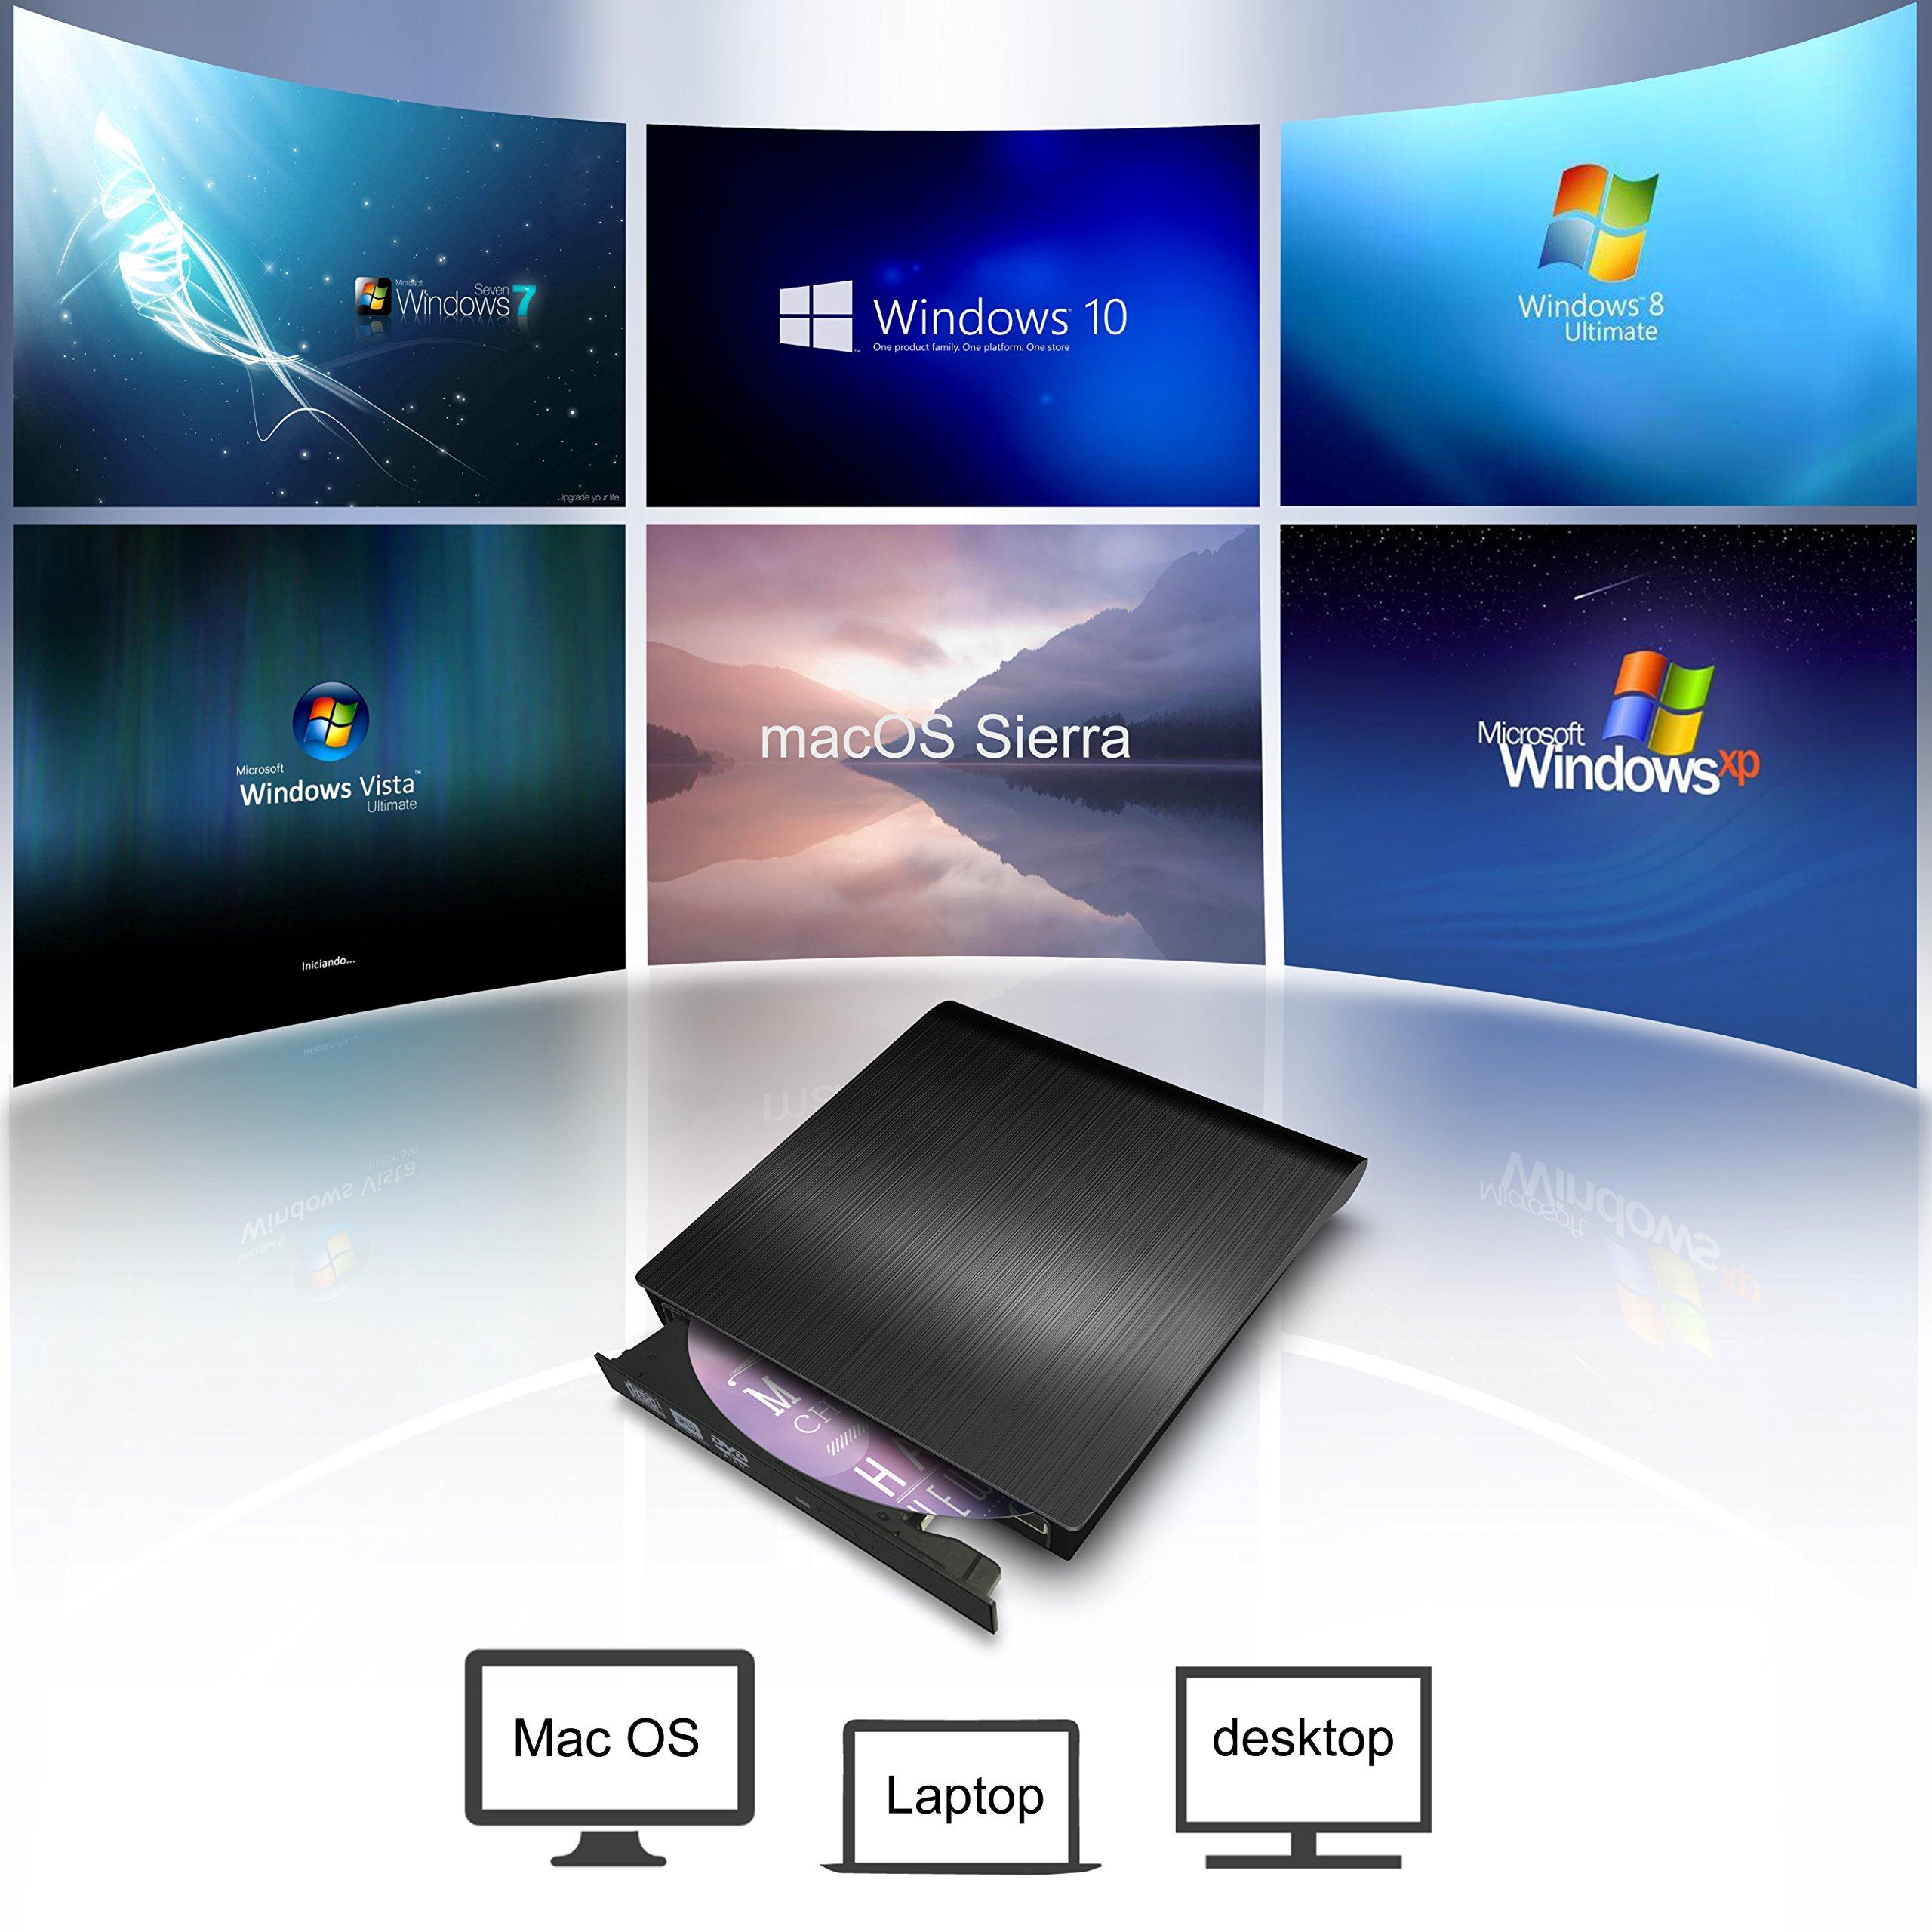 External CD DVD Drive,Valoin High Speed USB 3.0 Data Transfer Super Slim CD DVD-RW DVD ROM Drive for Laptop Desktop MacBook Win 7/8/10/Vista/Mac OS by Valoin (Image #3)